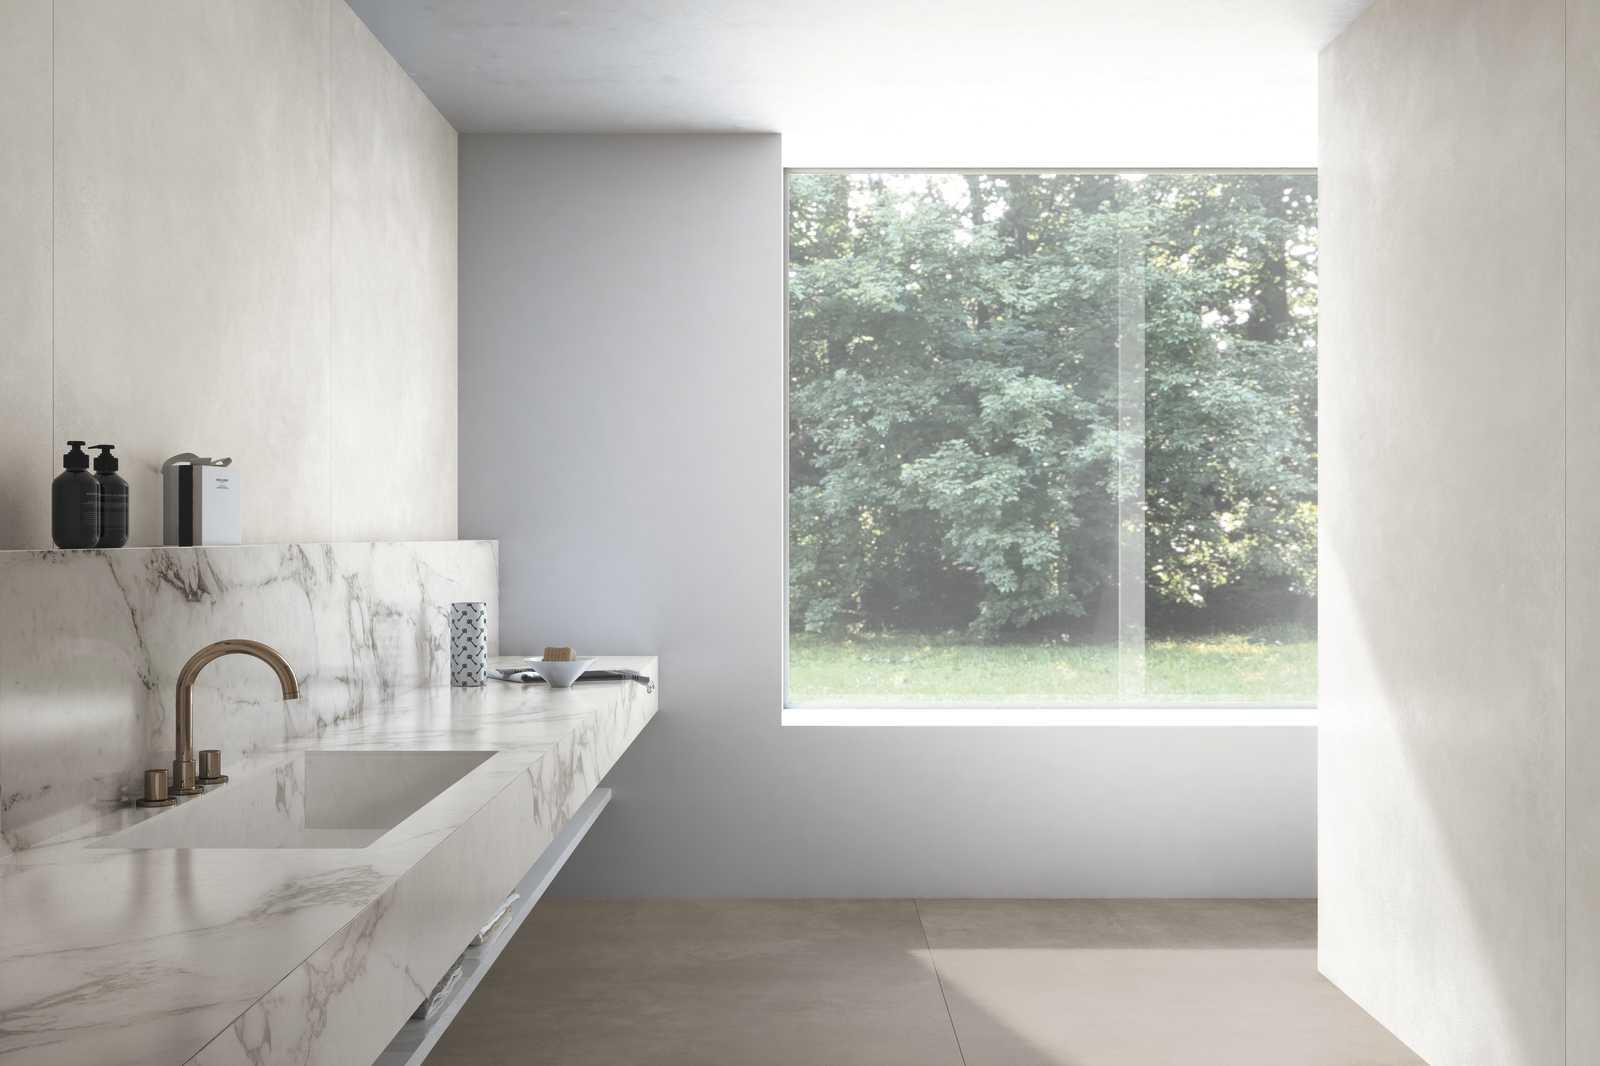 Marazzi_Grande_Concrete_Look_015.jpg.1920x0_q75_crop